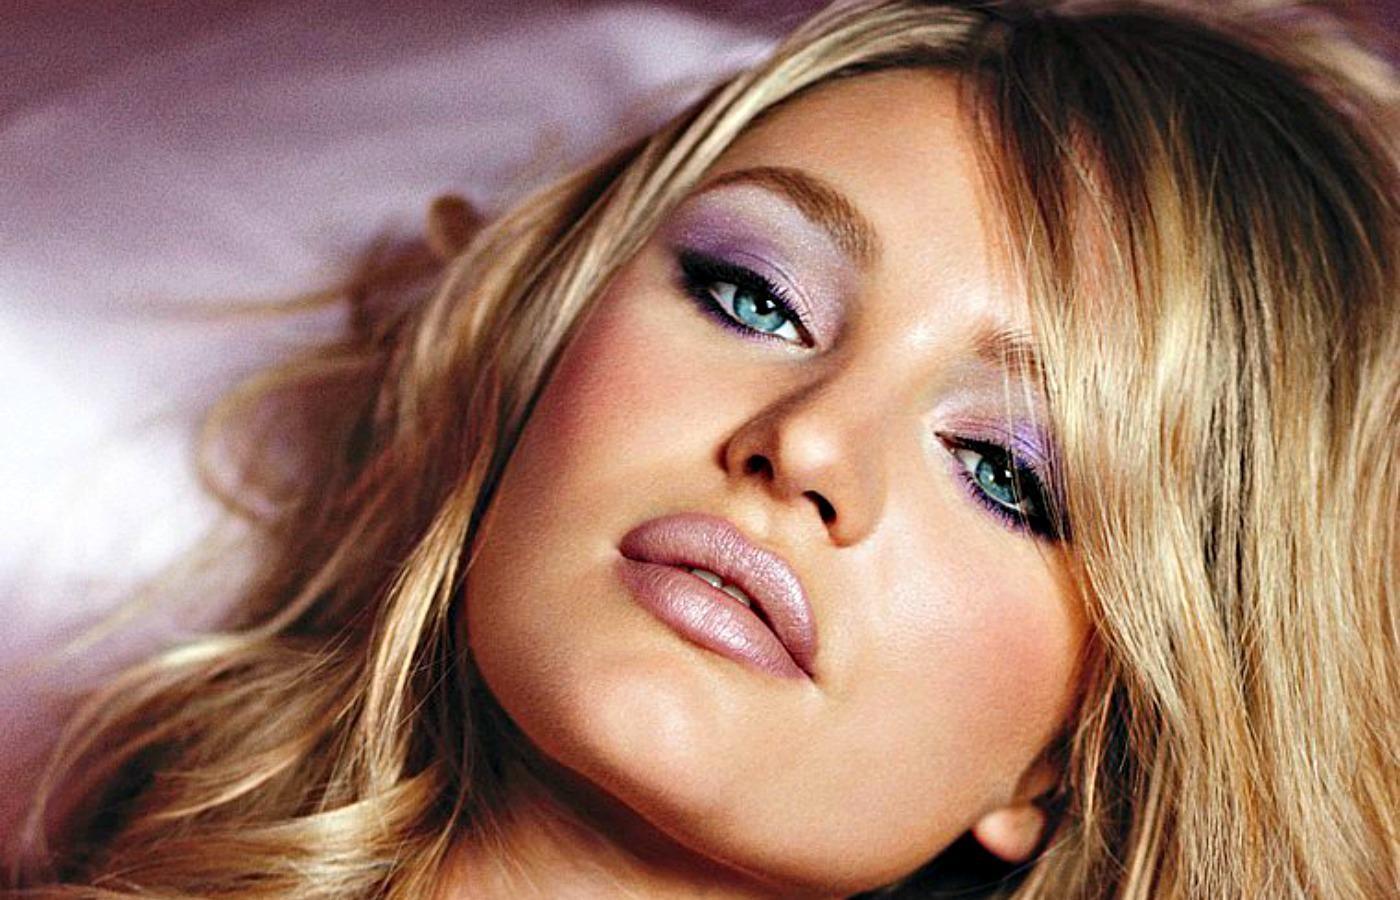 Wallpaper Face Women Model Singer Blue Mouth Nose: Wallpaper : Face, Women, Model, Blonde, Long Hair, Singer